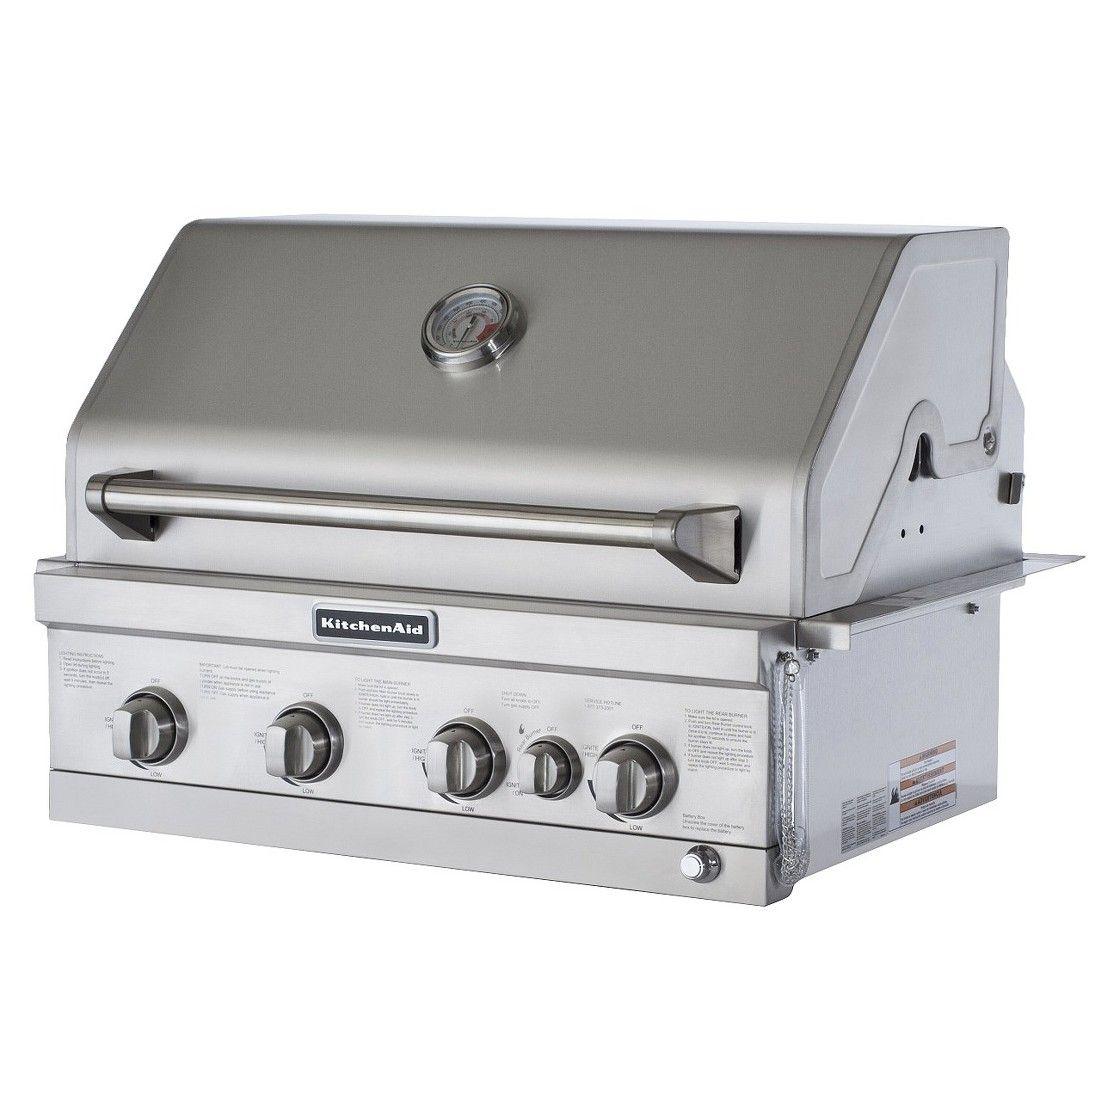 Kitchenaid 4 burner builtin propane gas island grill with